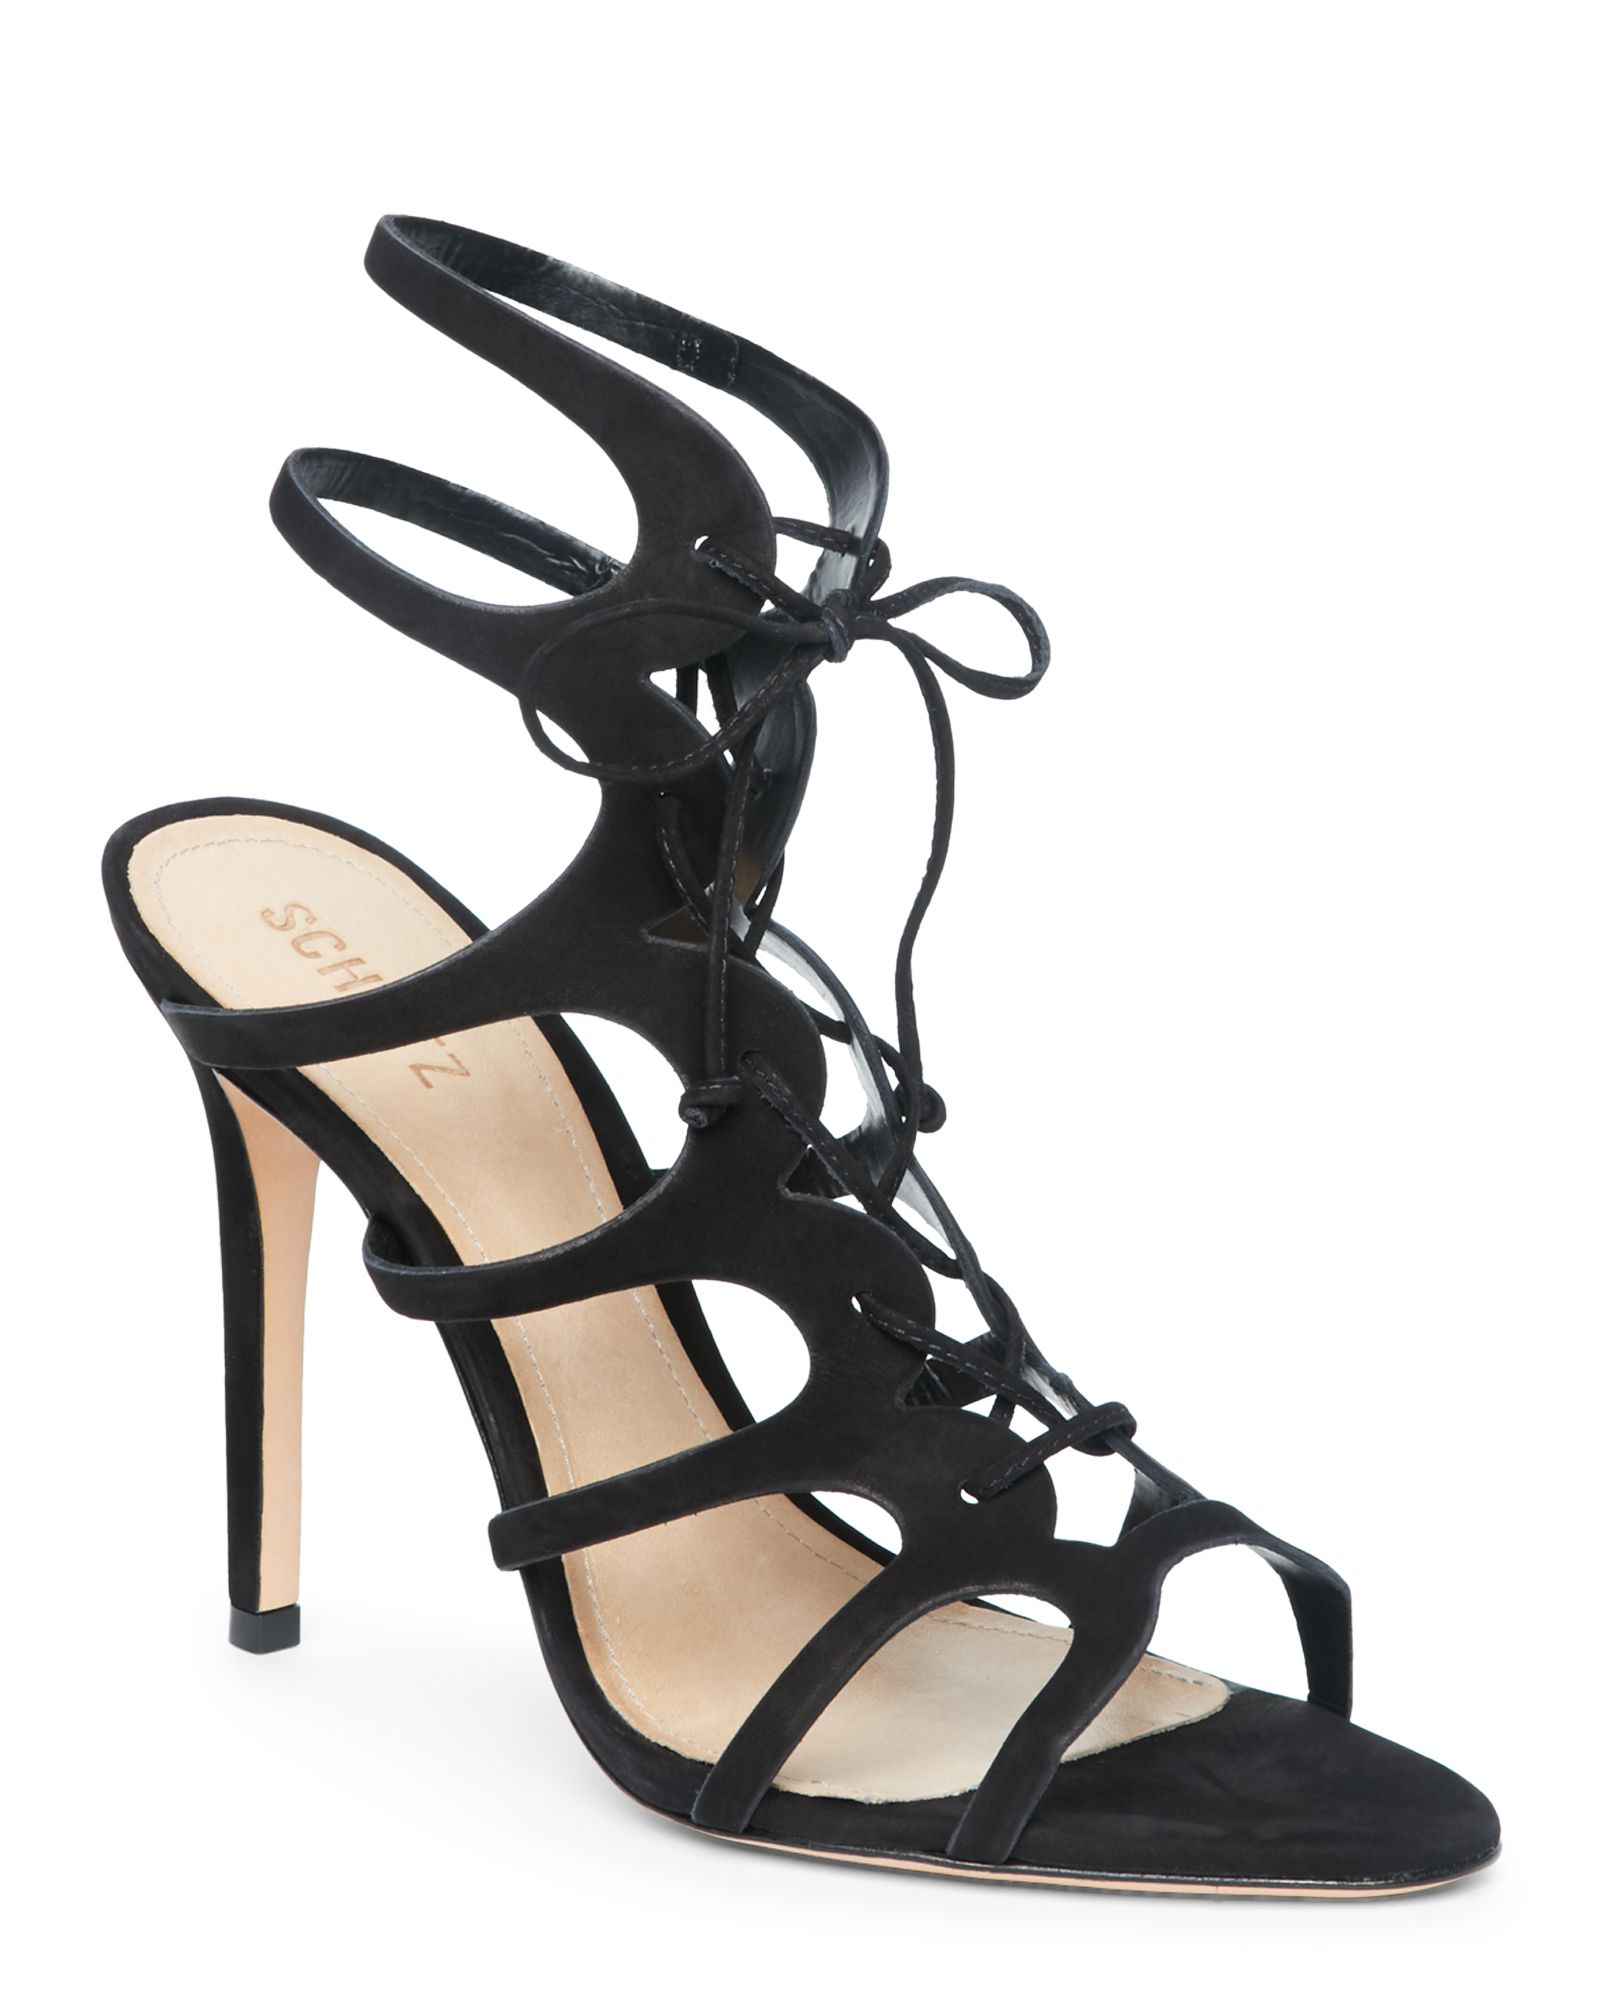 Schutz Black Laurine High Heel Lace-Up Sandals